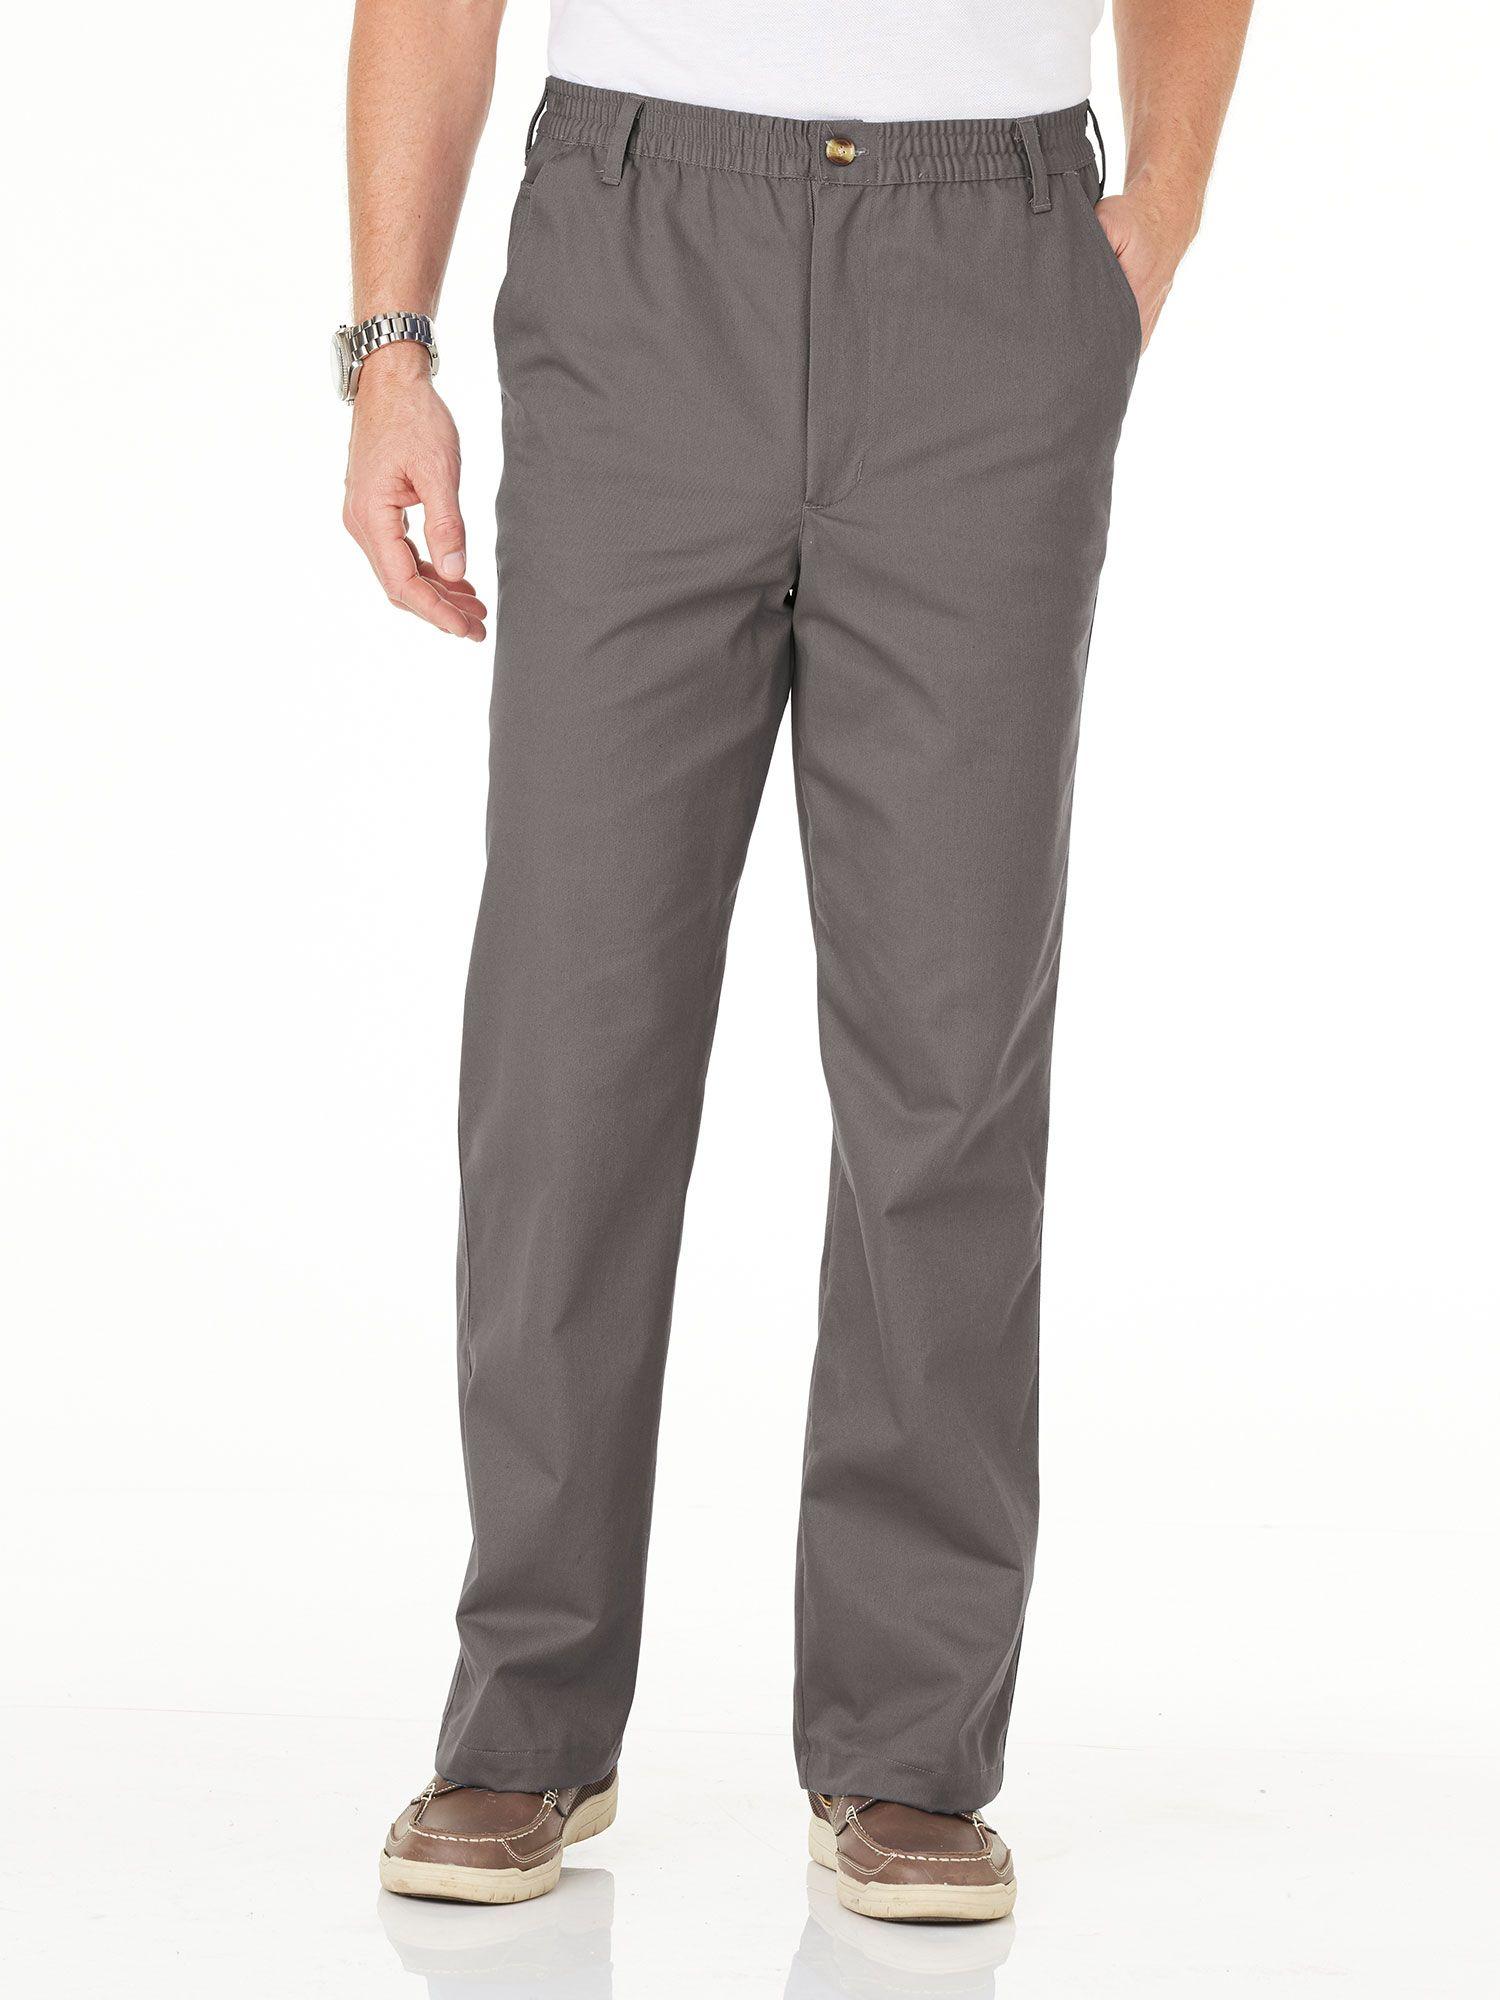 Haband - Men's Casual Joe® Stretch-Waist Twill Pants